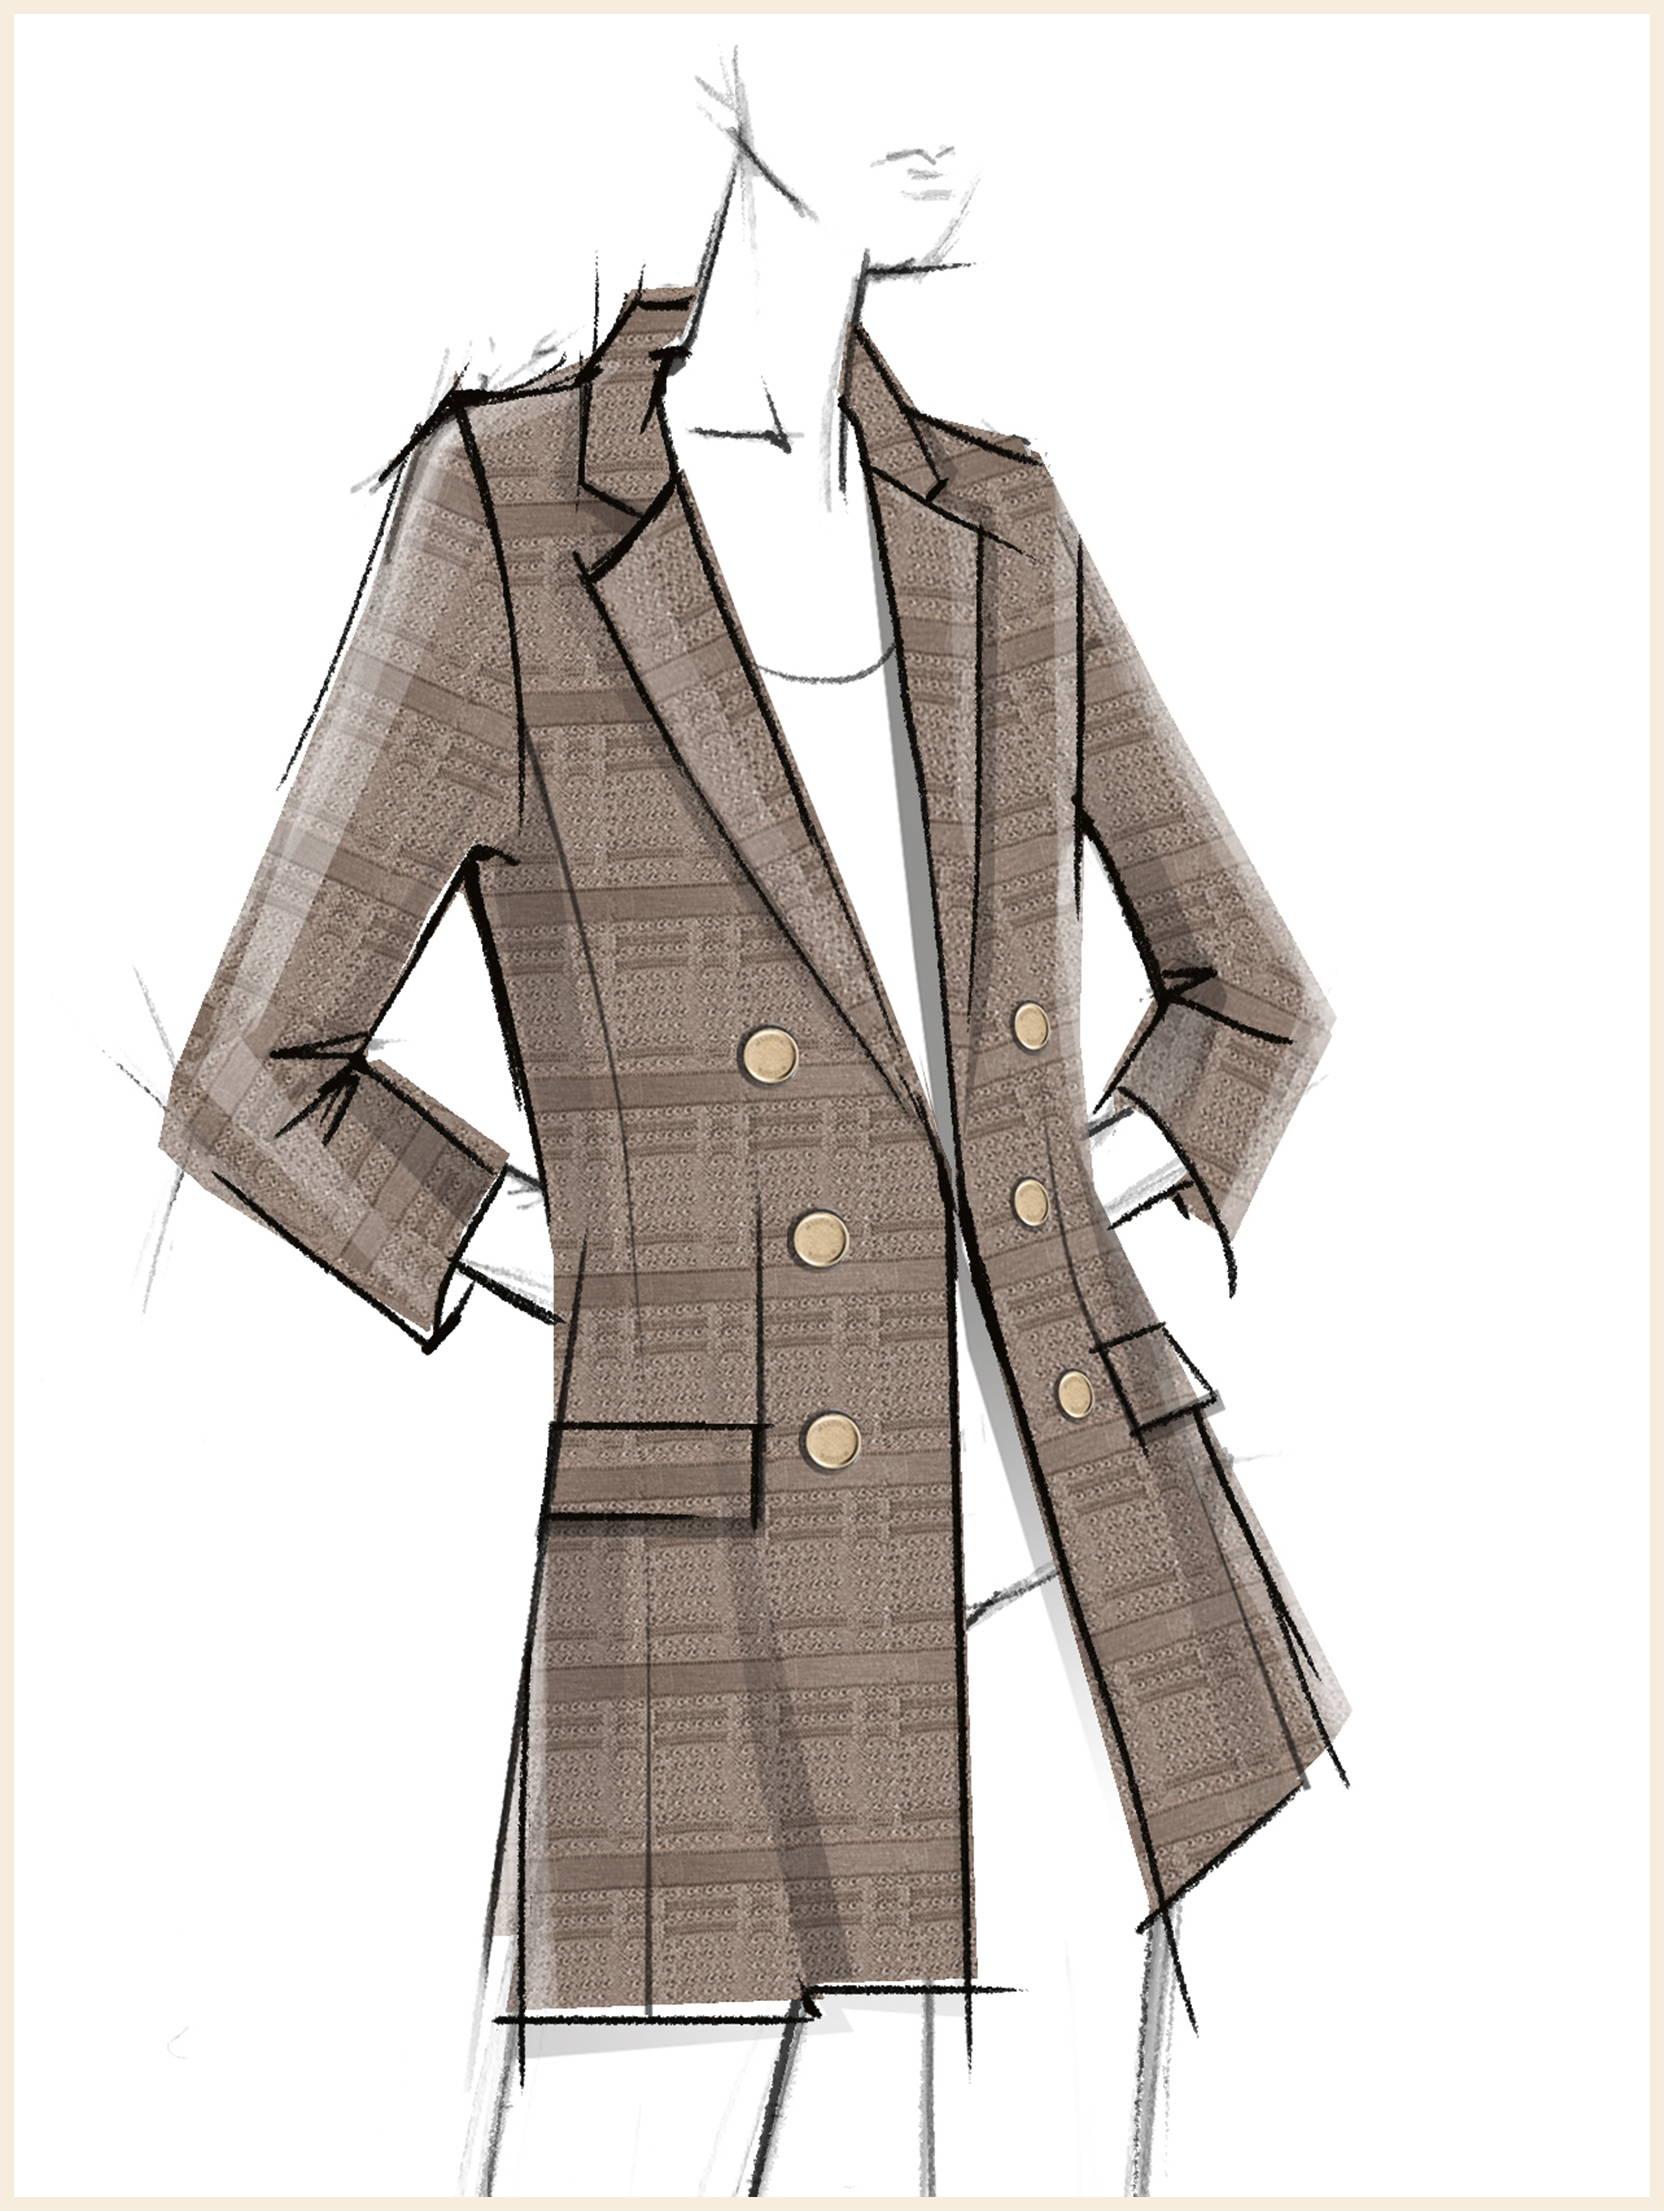 Sketch off Tailored Signature Knit Jacket, Macchiato